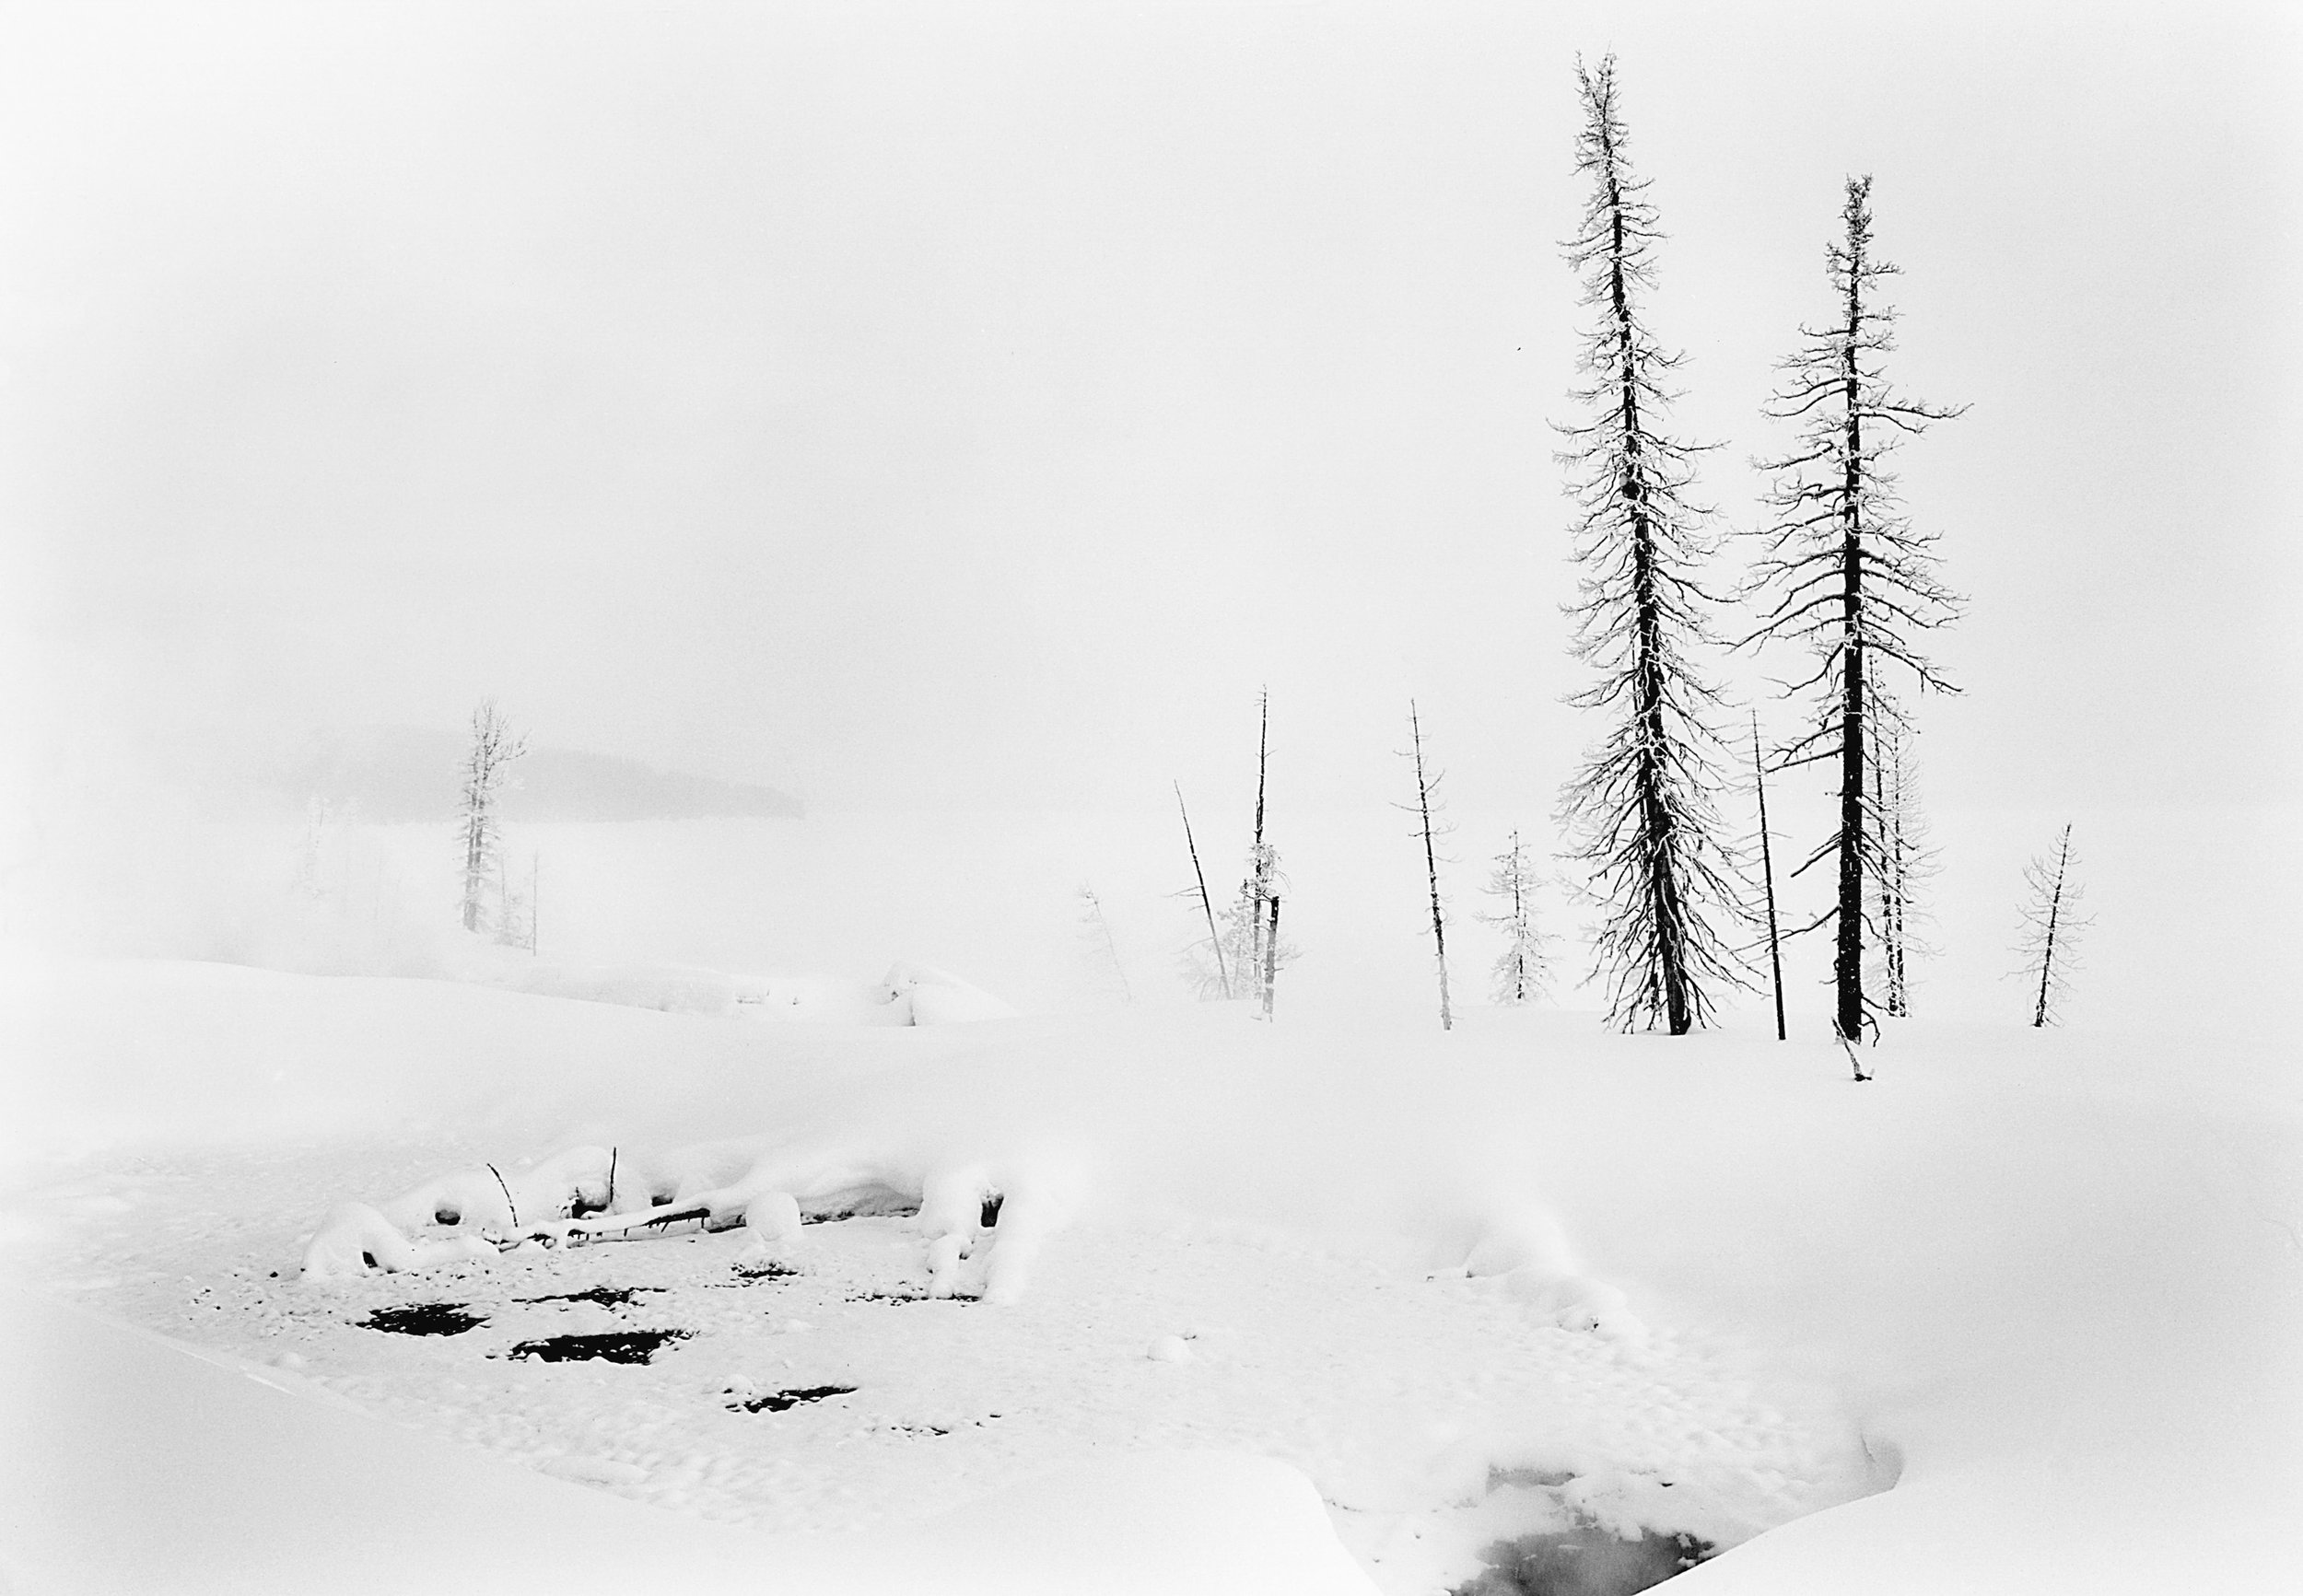 West Thumb, Geyser Basin Yellowstone Lake